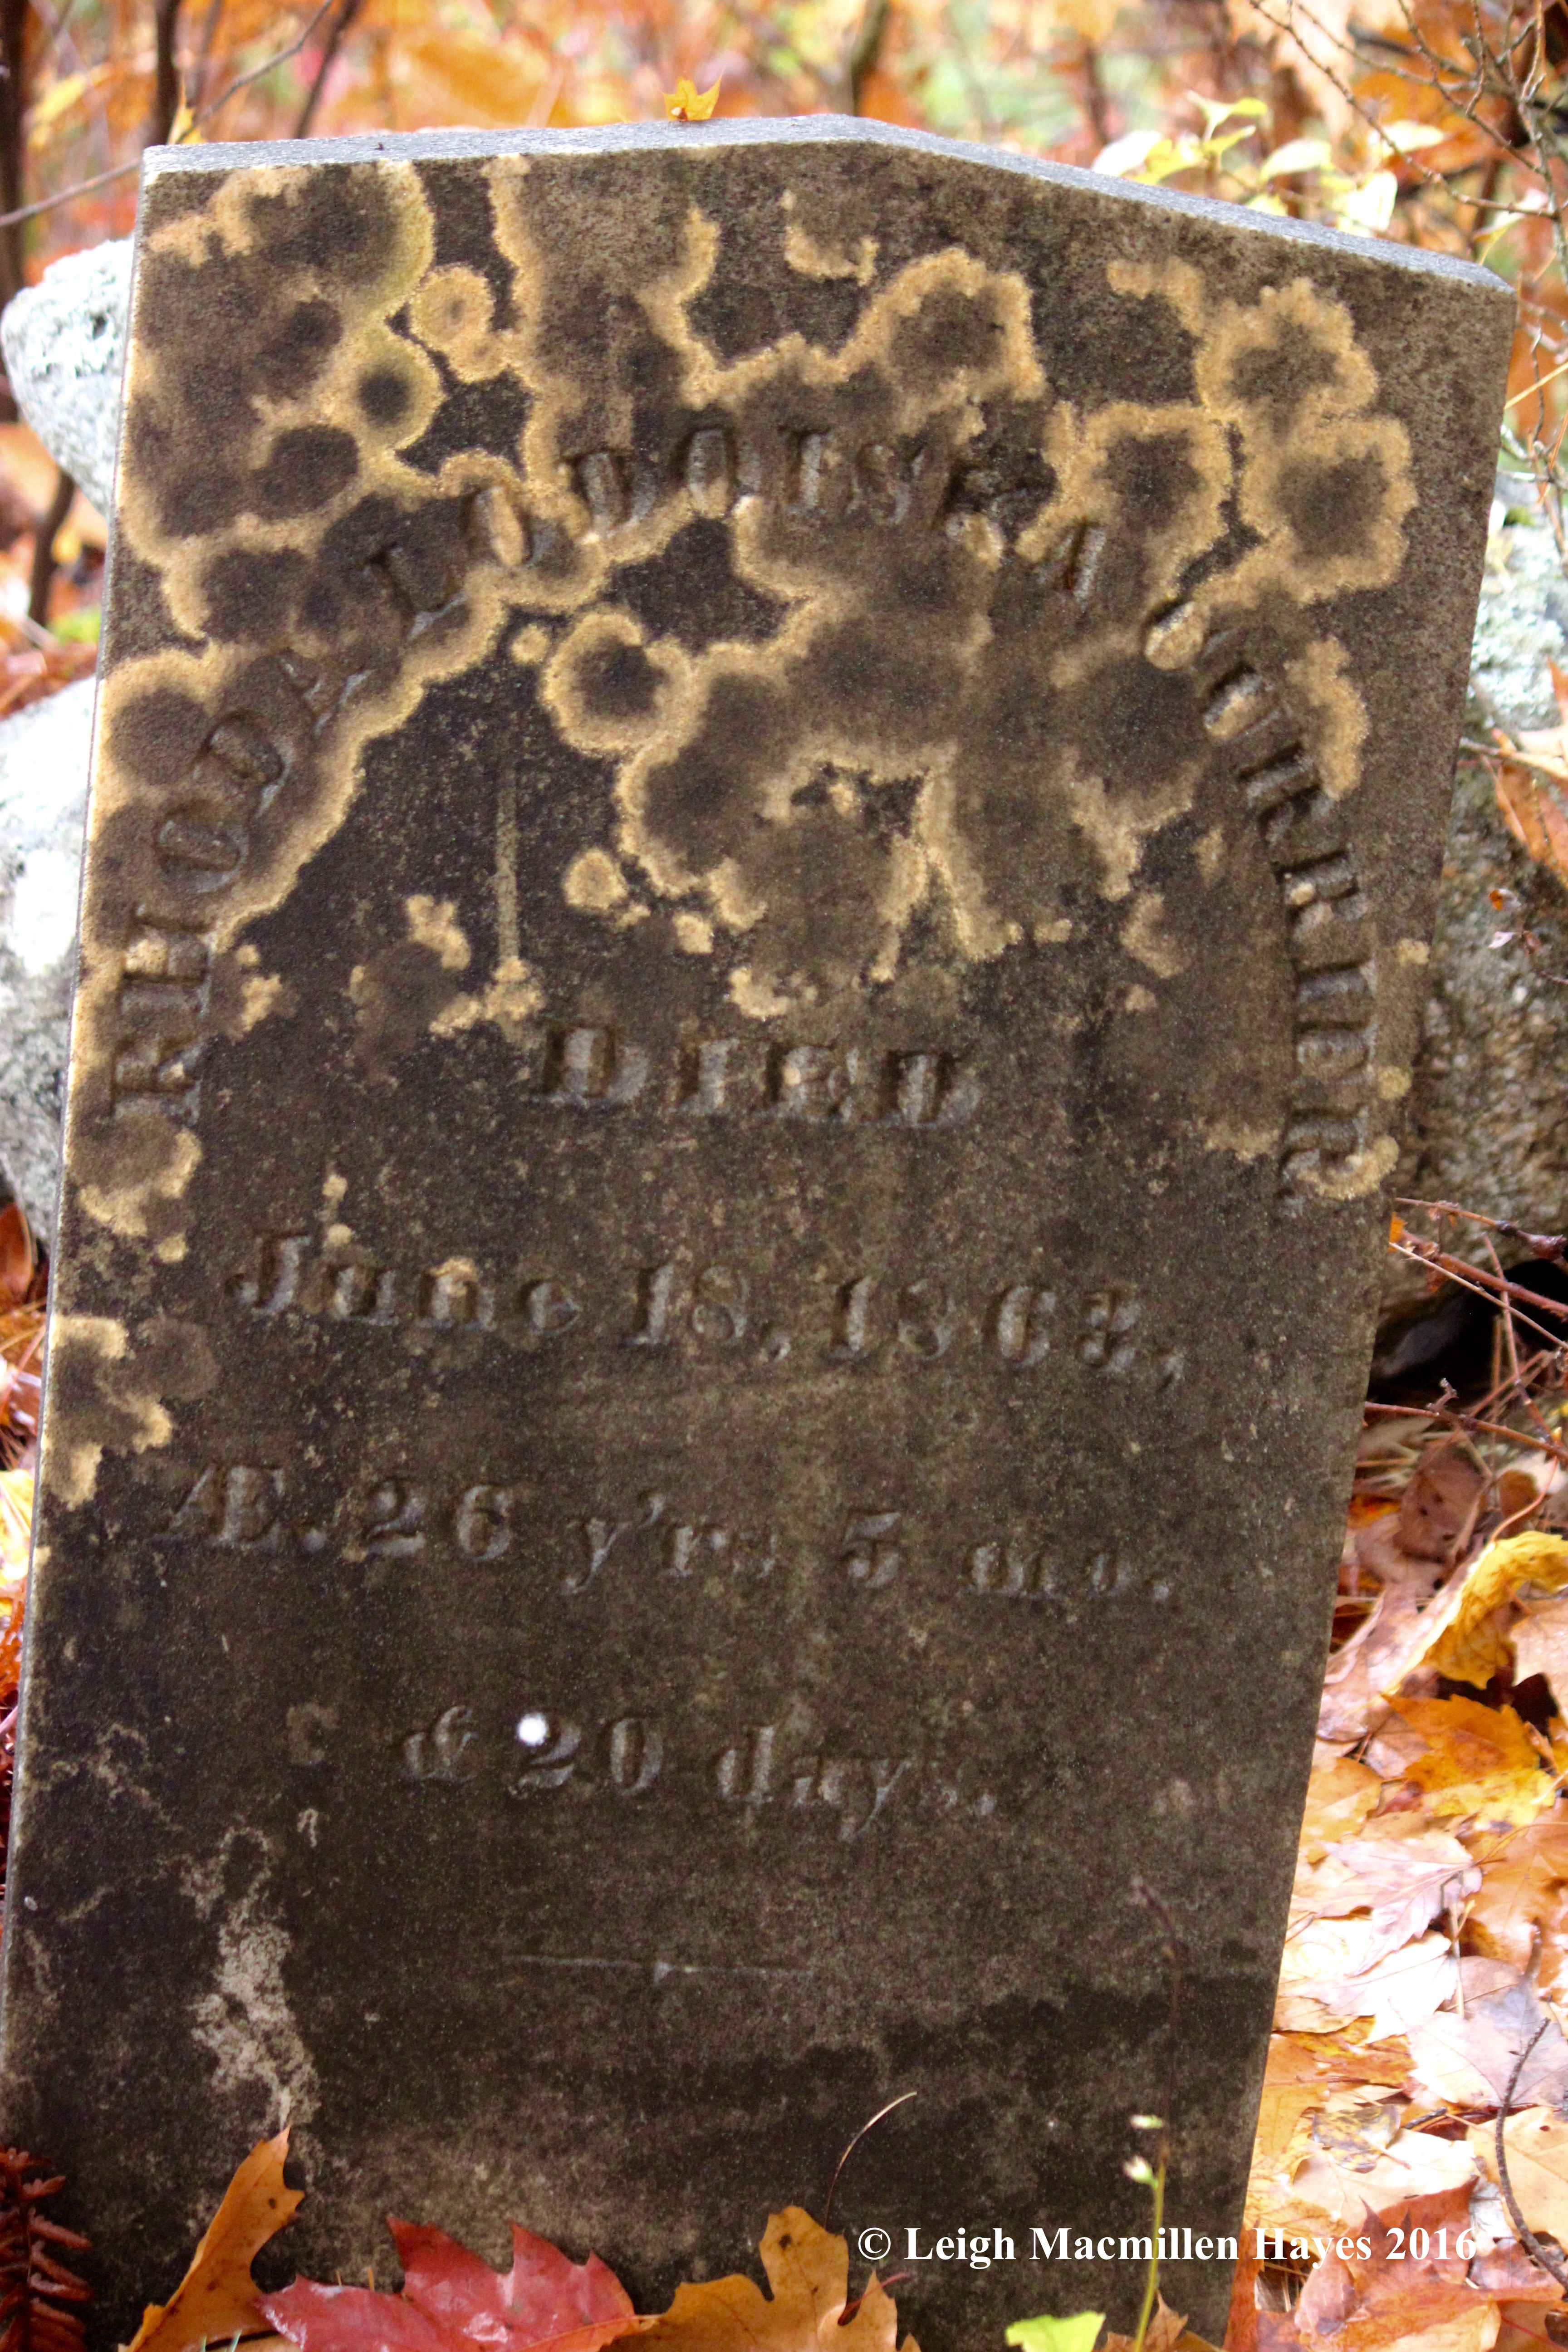 u-cemetery-lichens